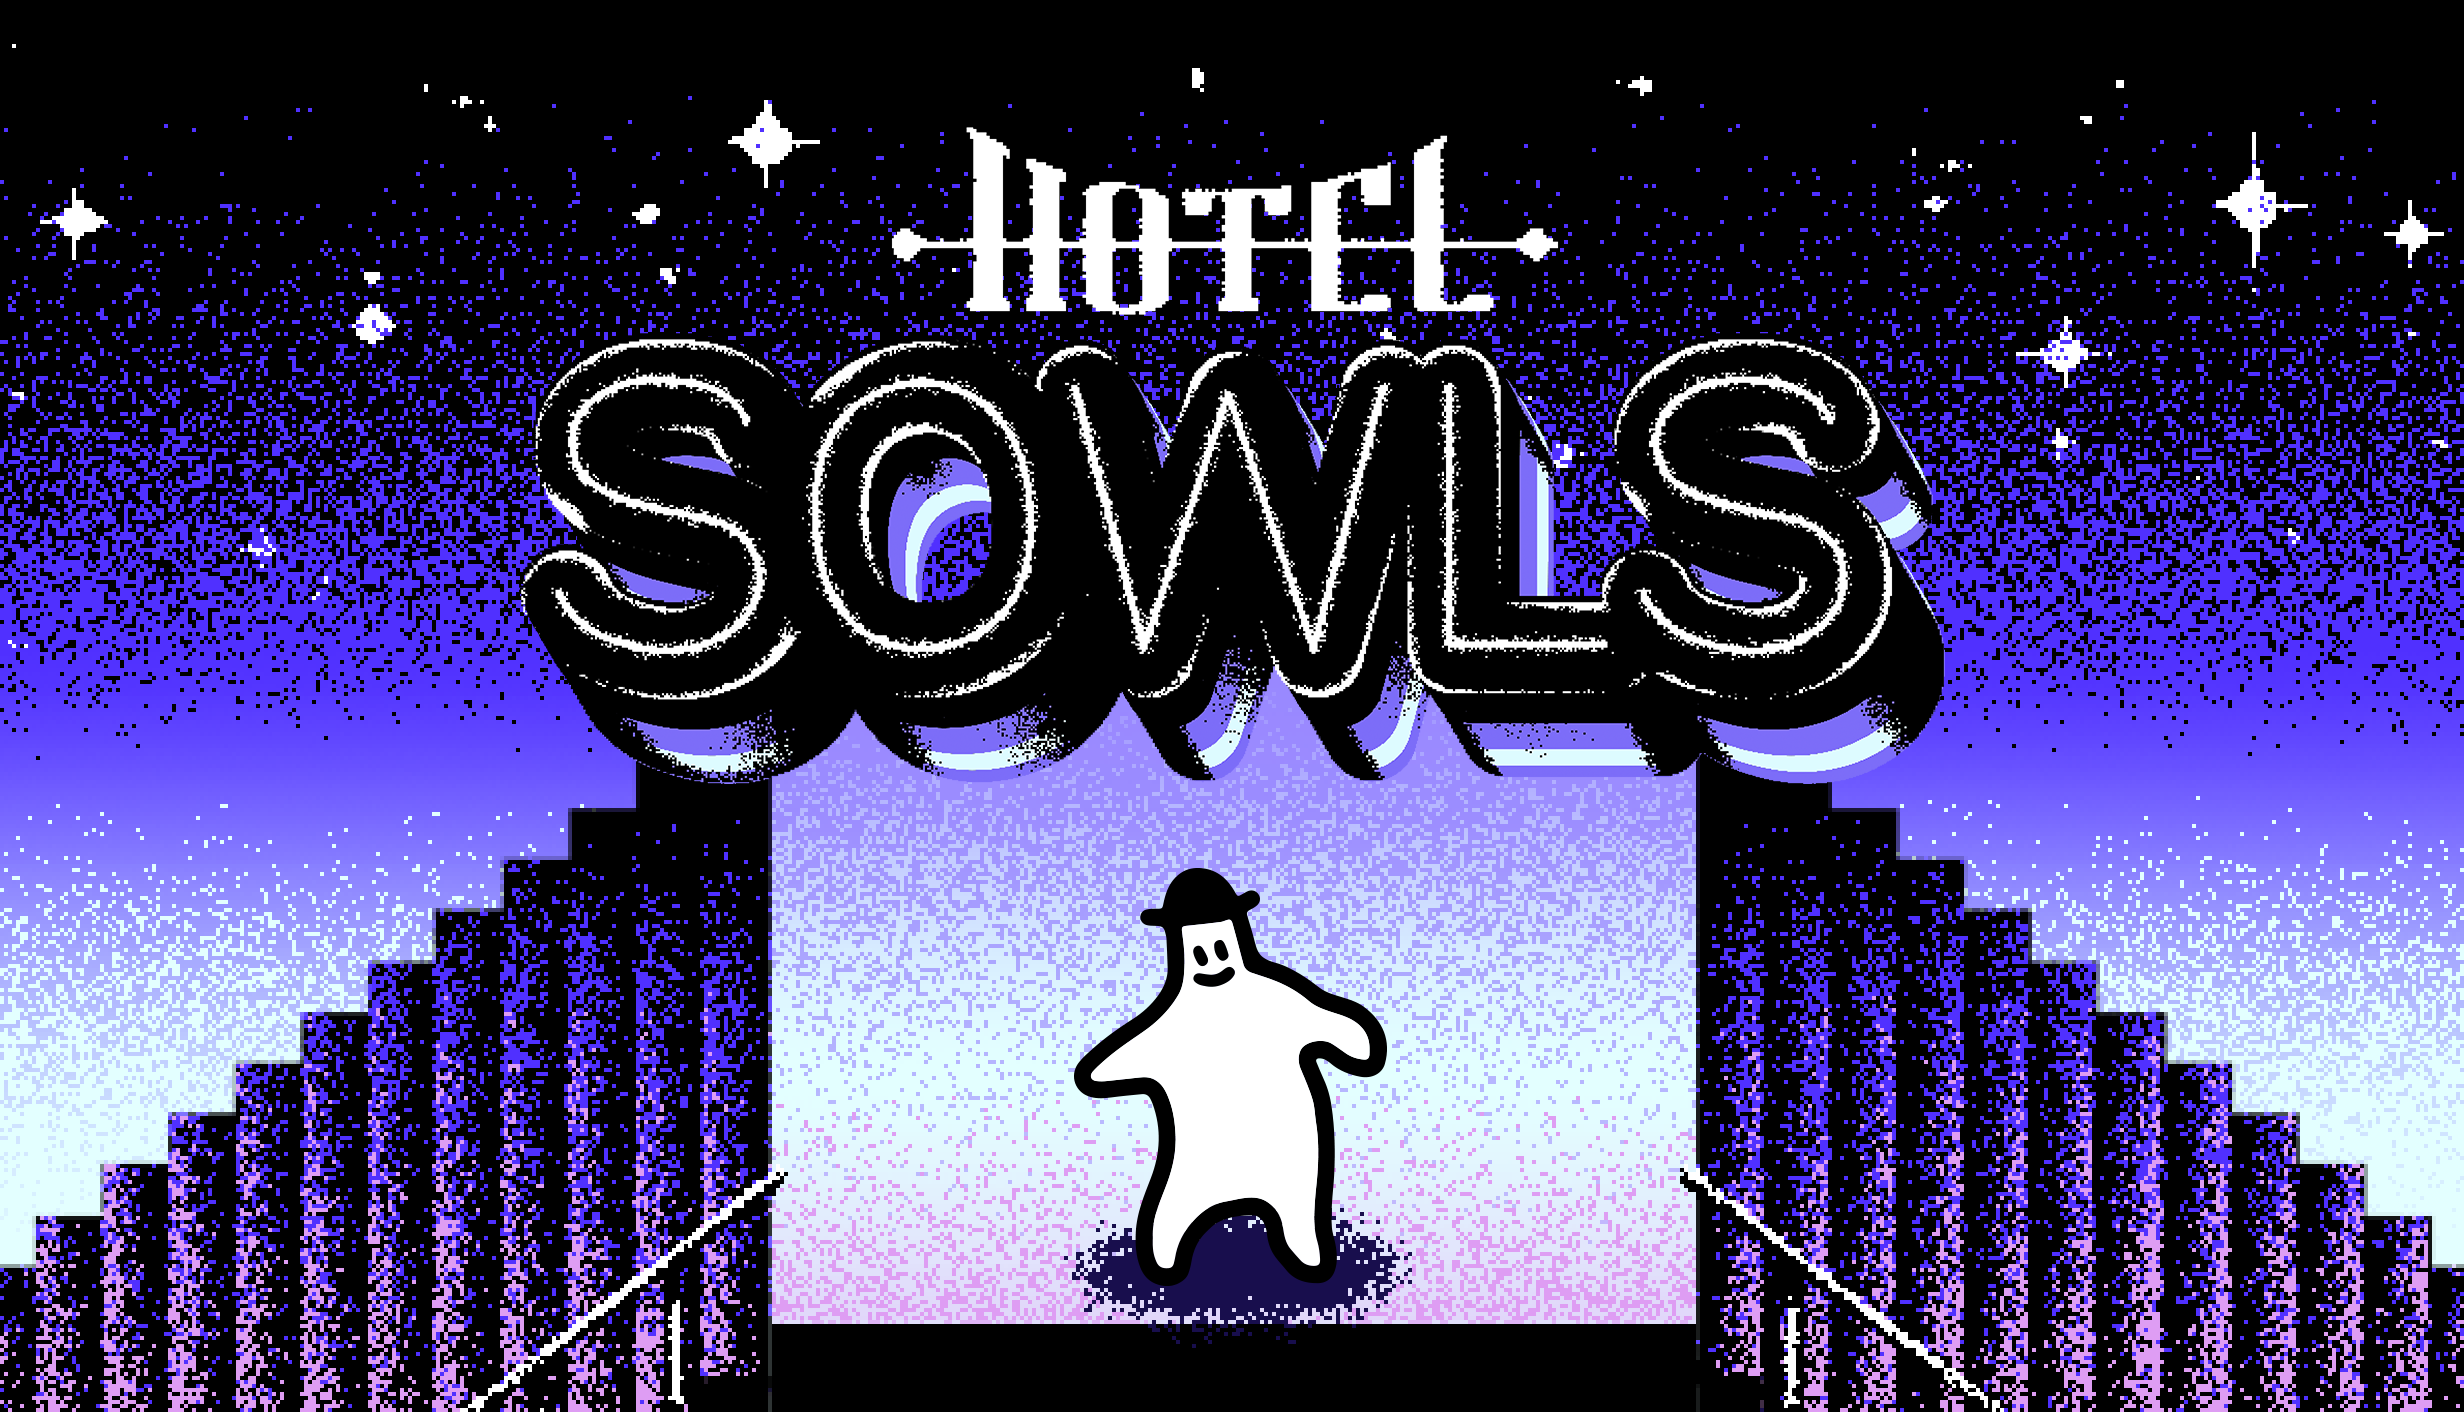 [MWU Korea 2019] 호텔 소울즈 / 스튜디오 소트